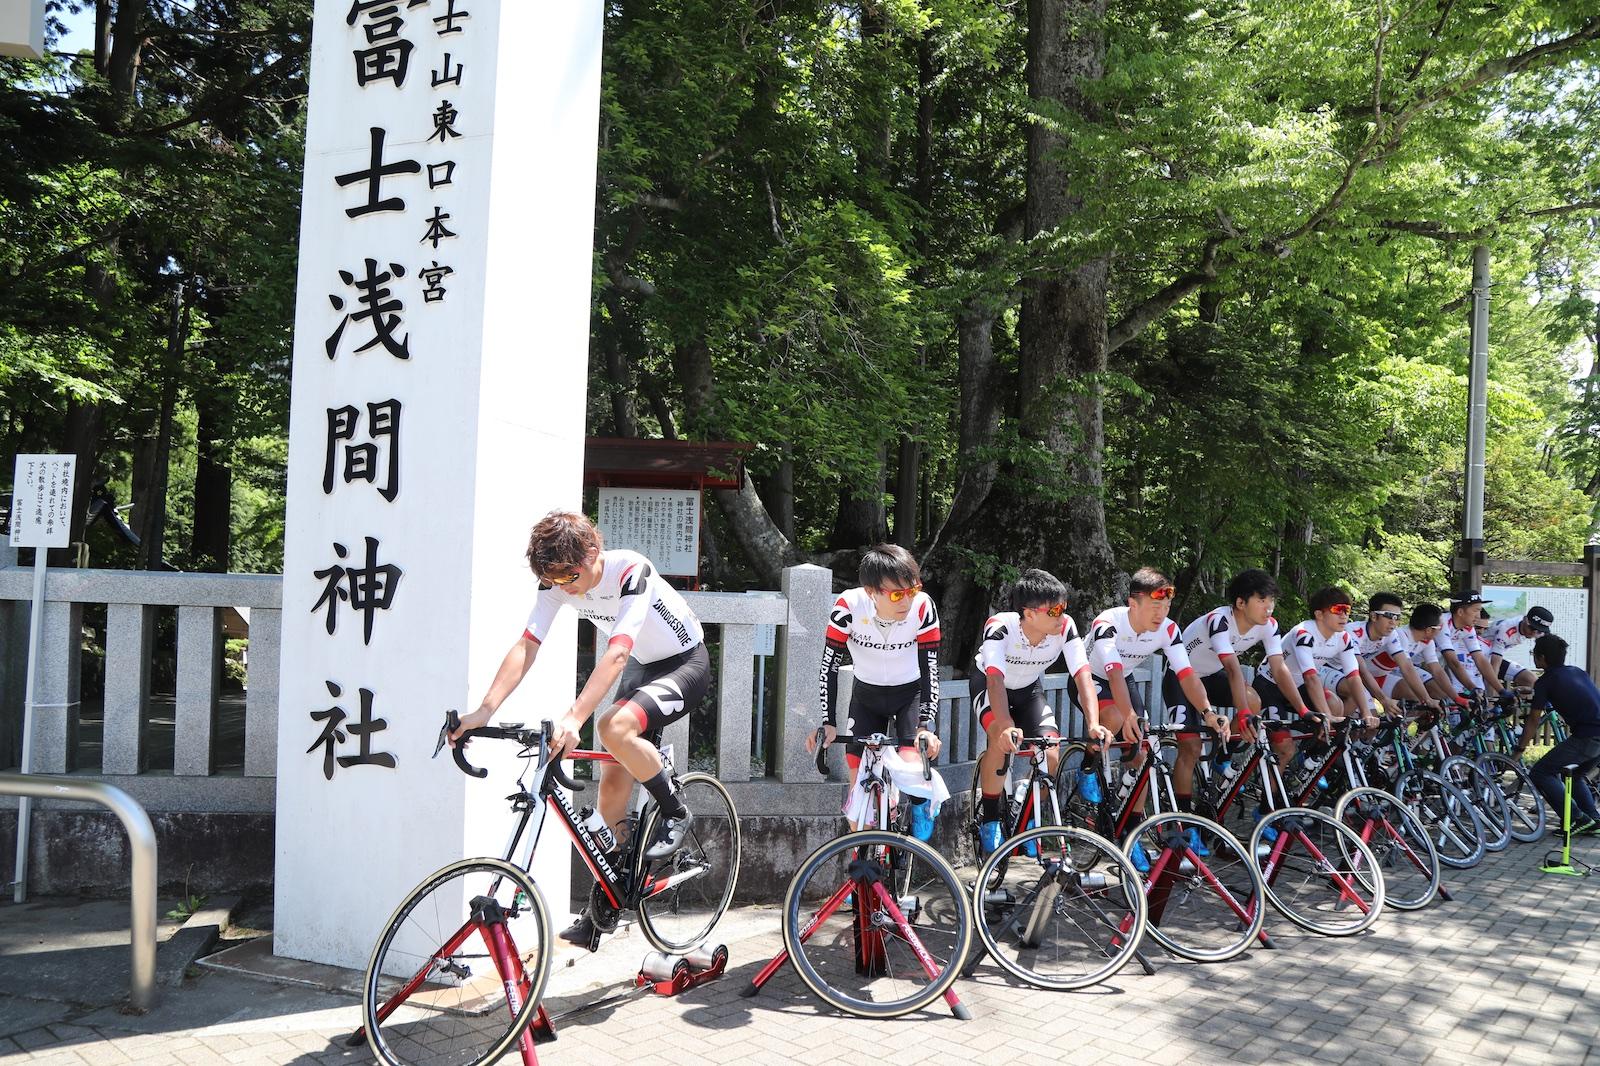 【TOJ2019】第6・富士山ステージ/ヒルクライムステージで石橋12位、総合順位を上げる